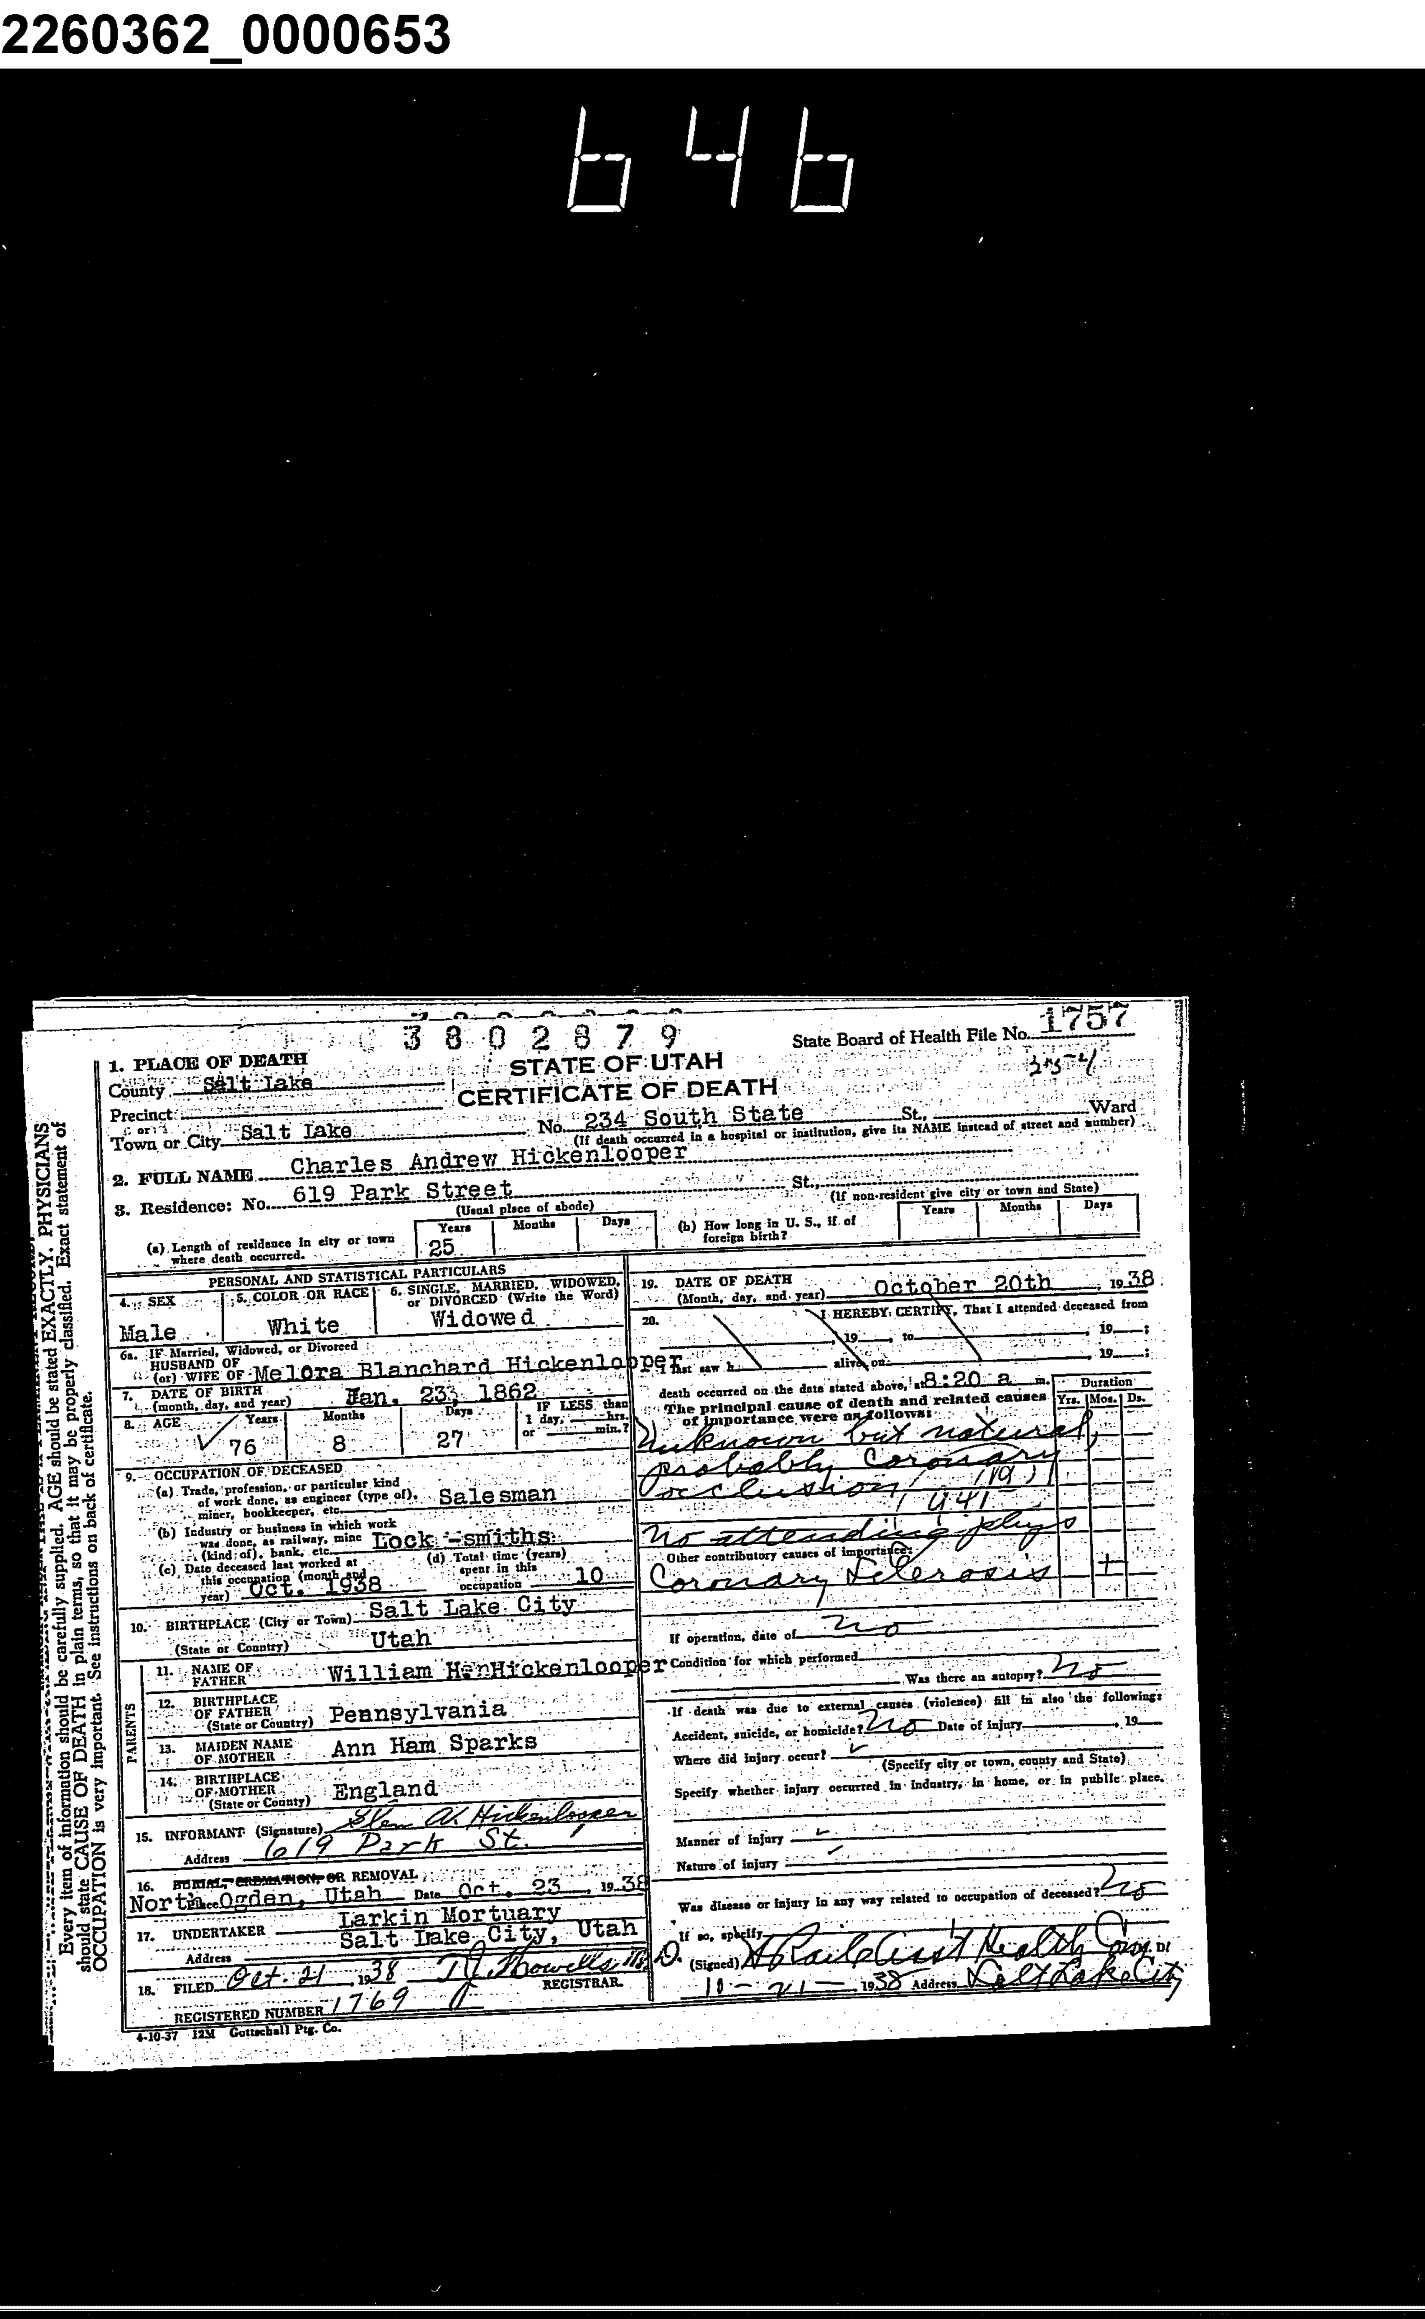 Charles Andrew Hickenlooper, Utah Death Certificates, 1904-1956 ...